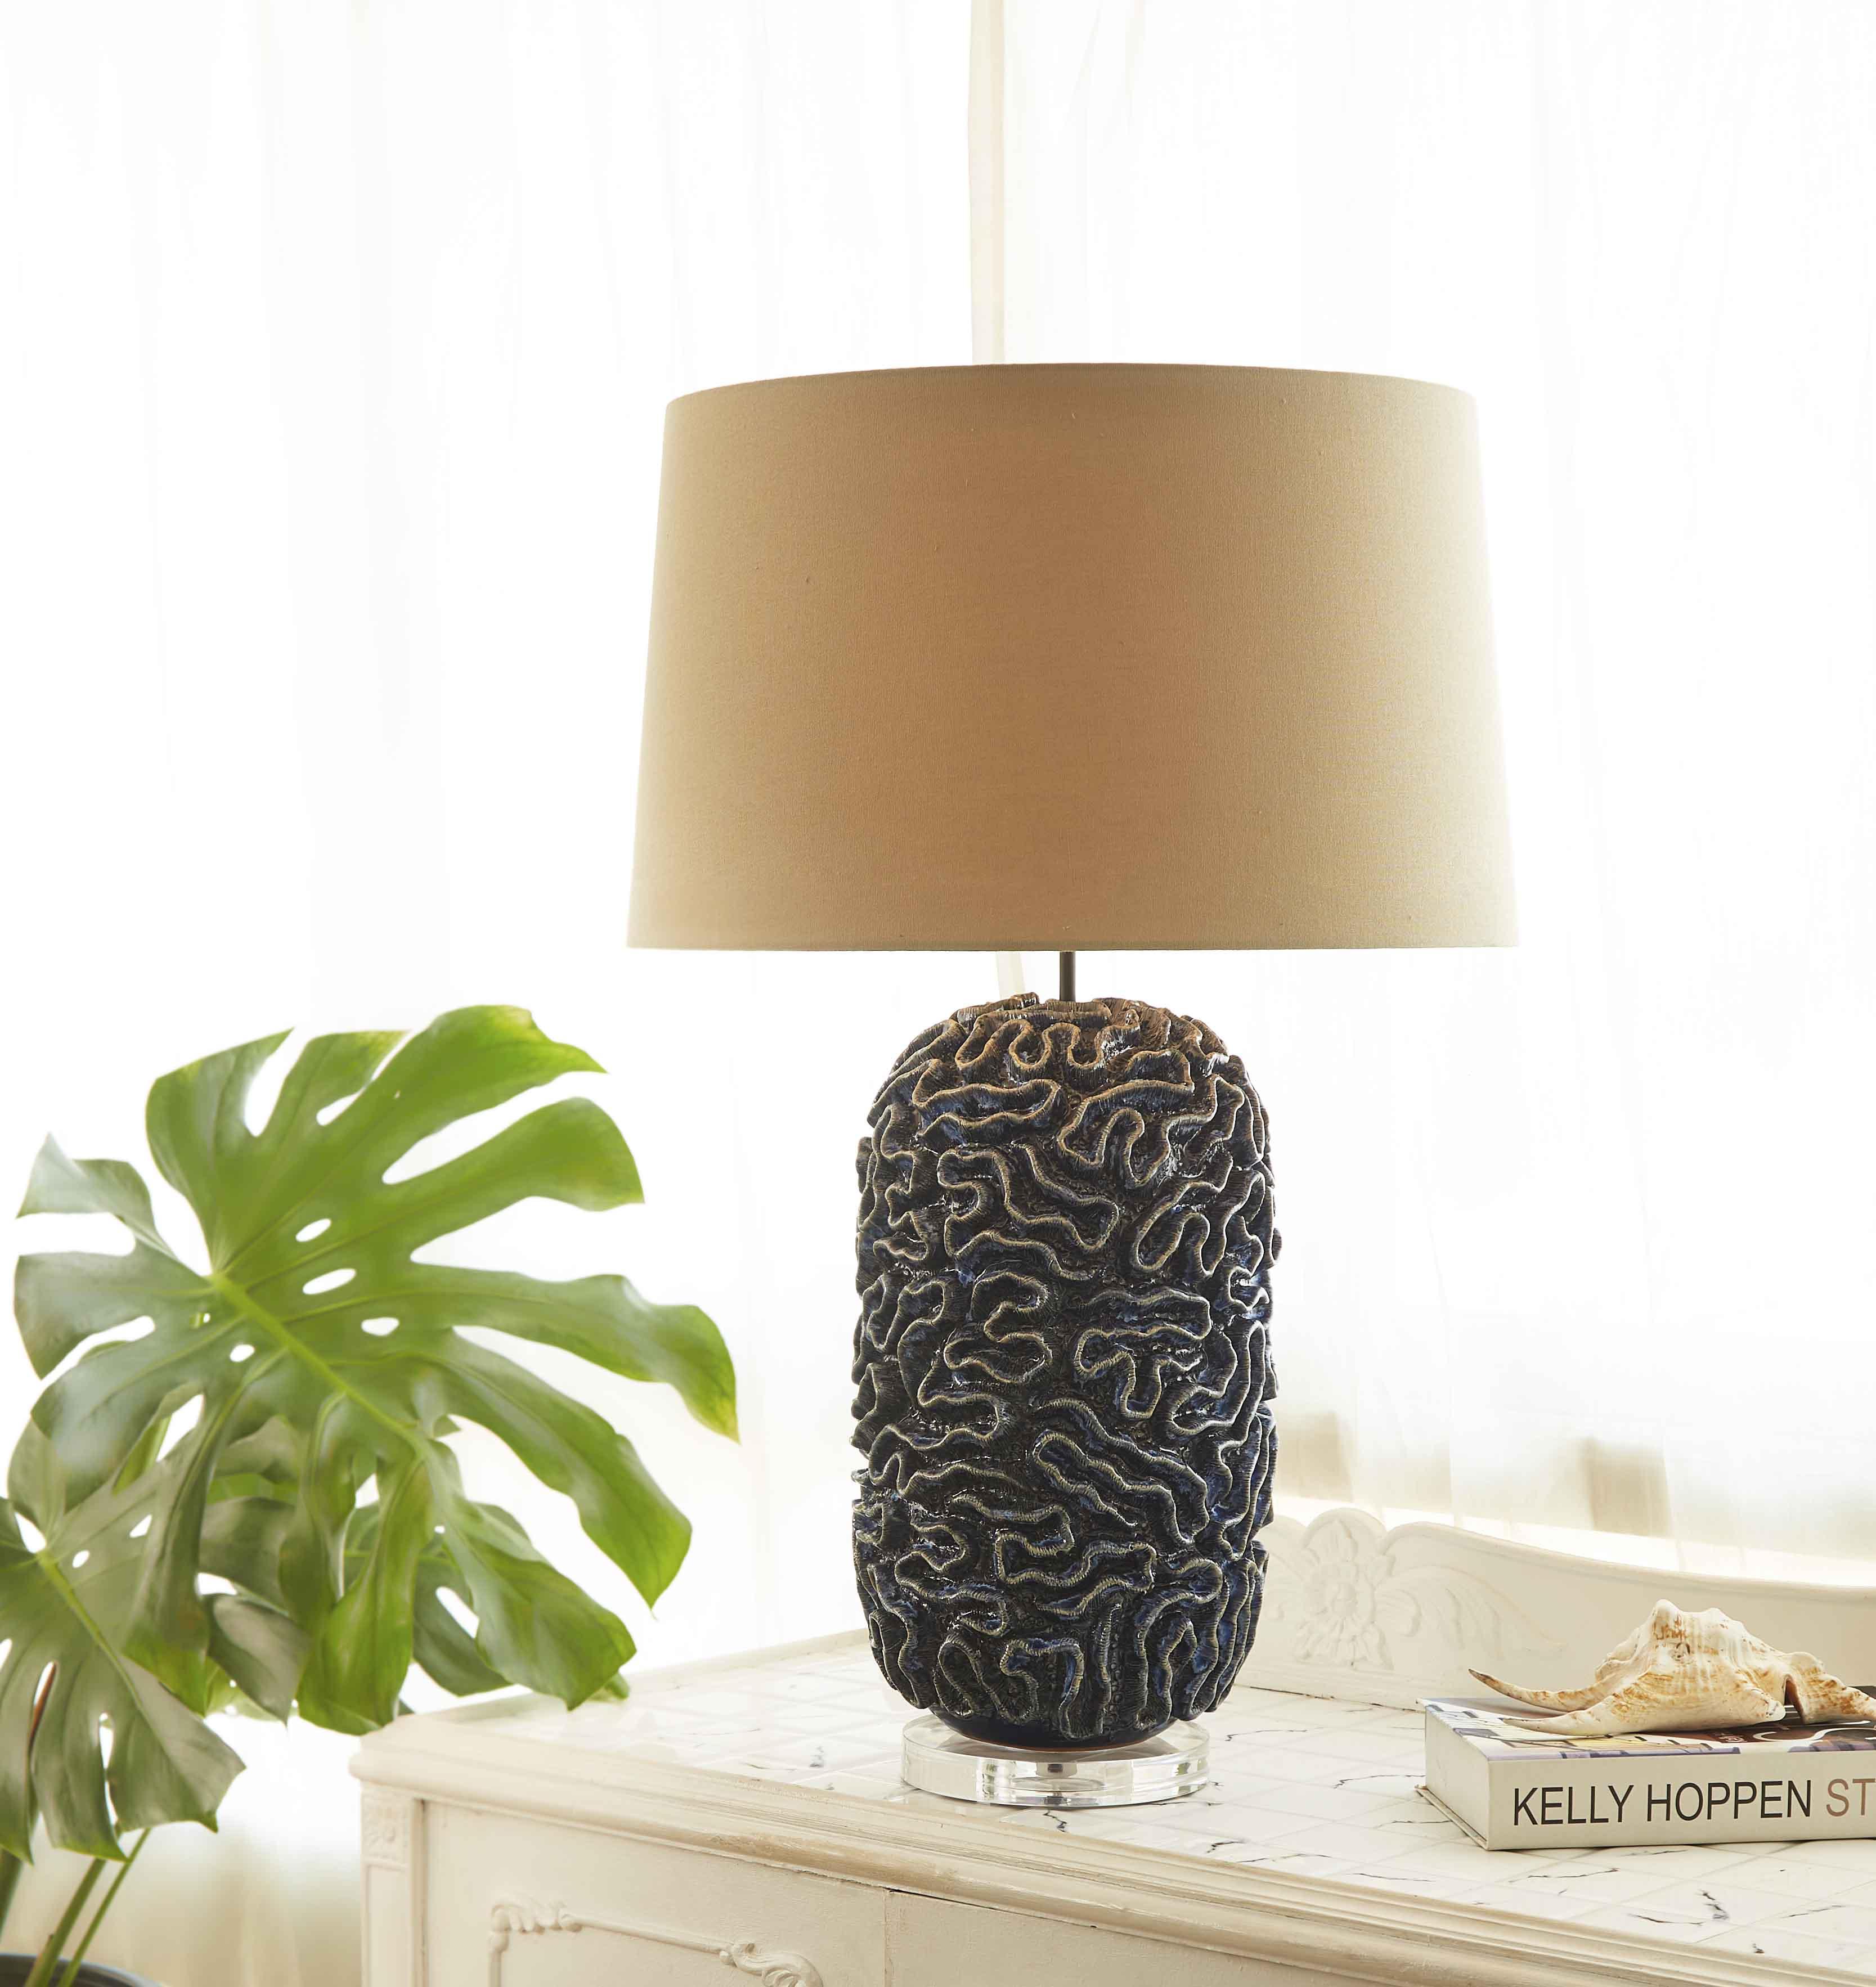 Similan ceramic product photo #1